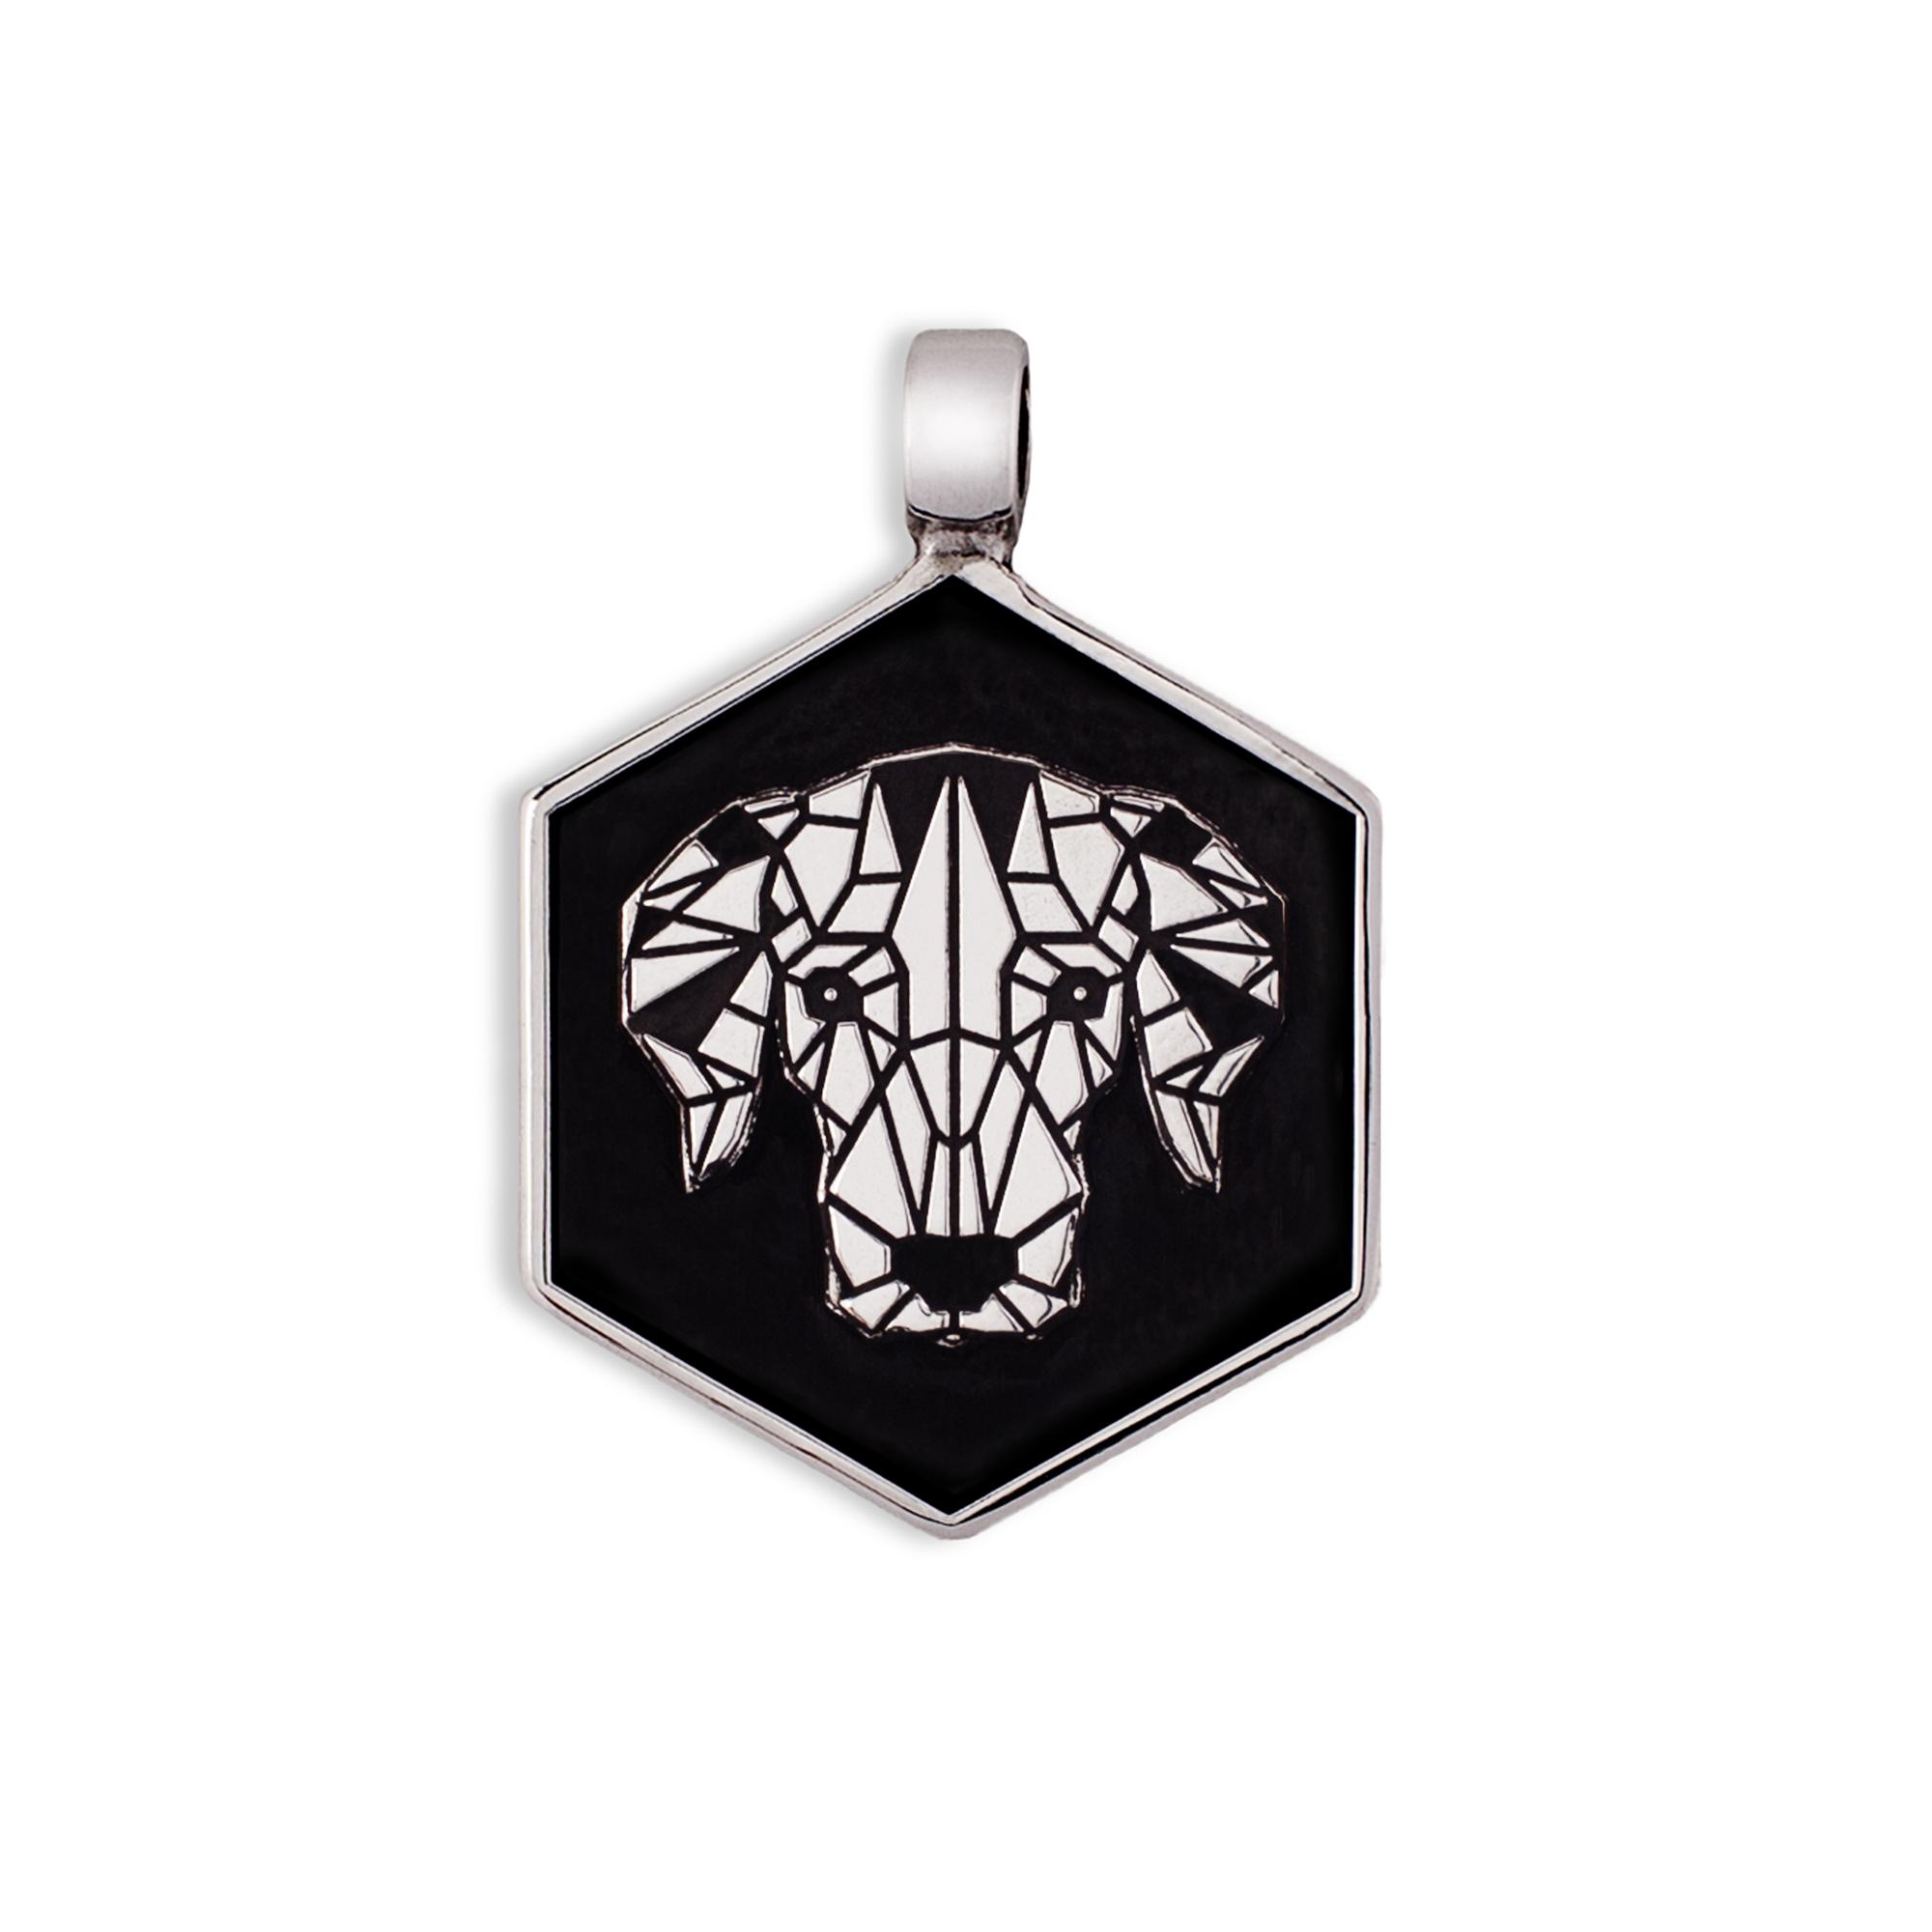 925 Silver Hound Medal/Tag